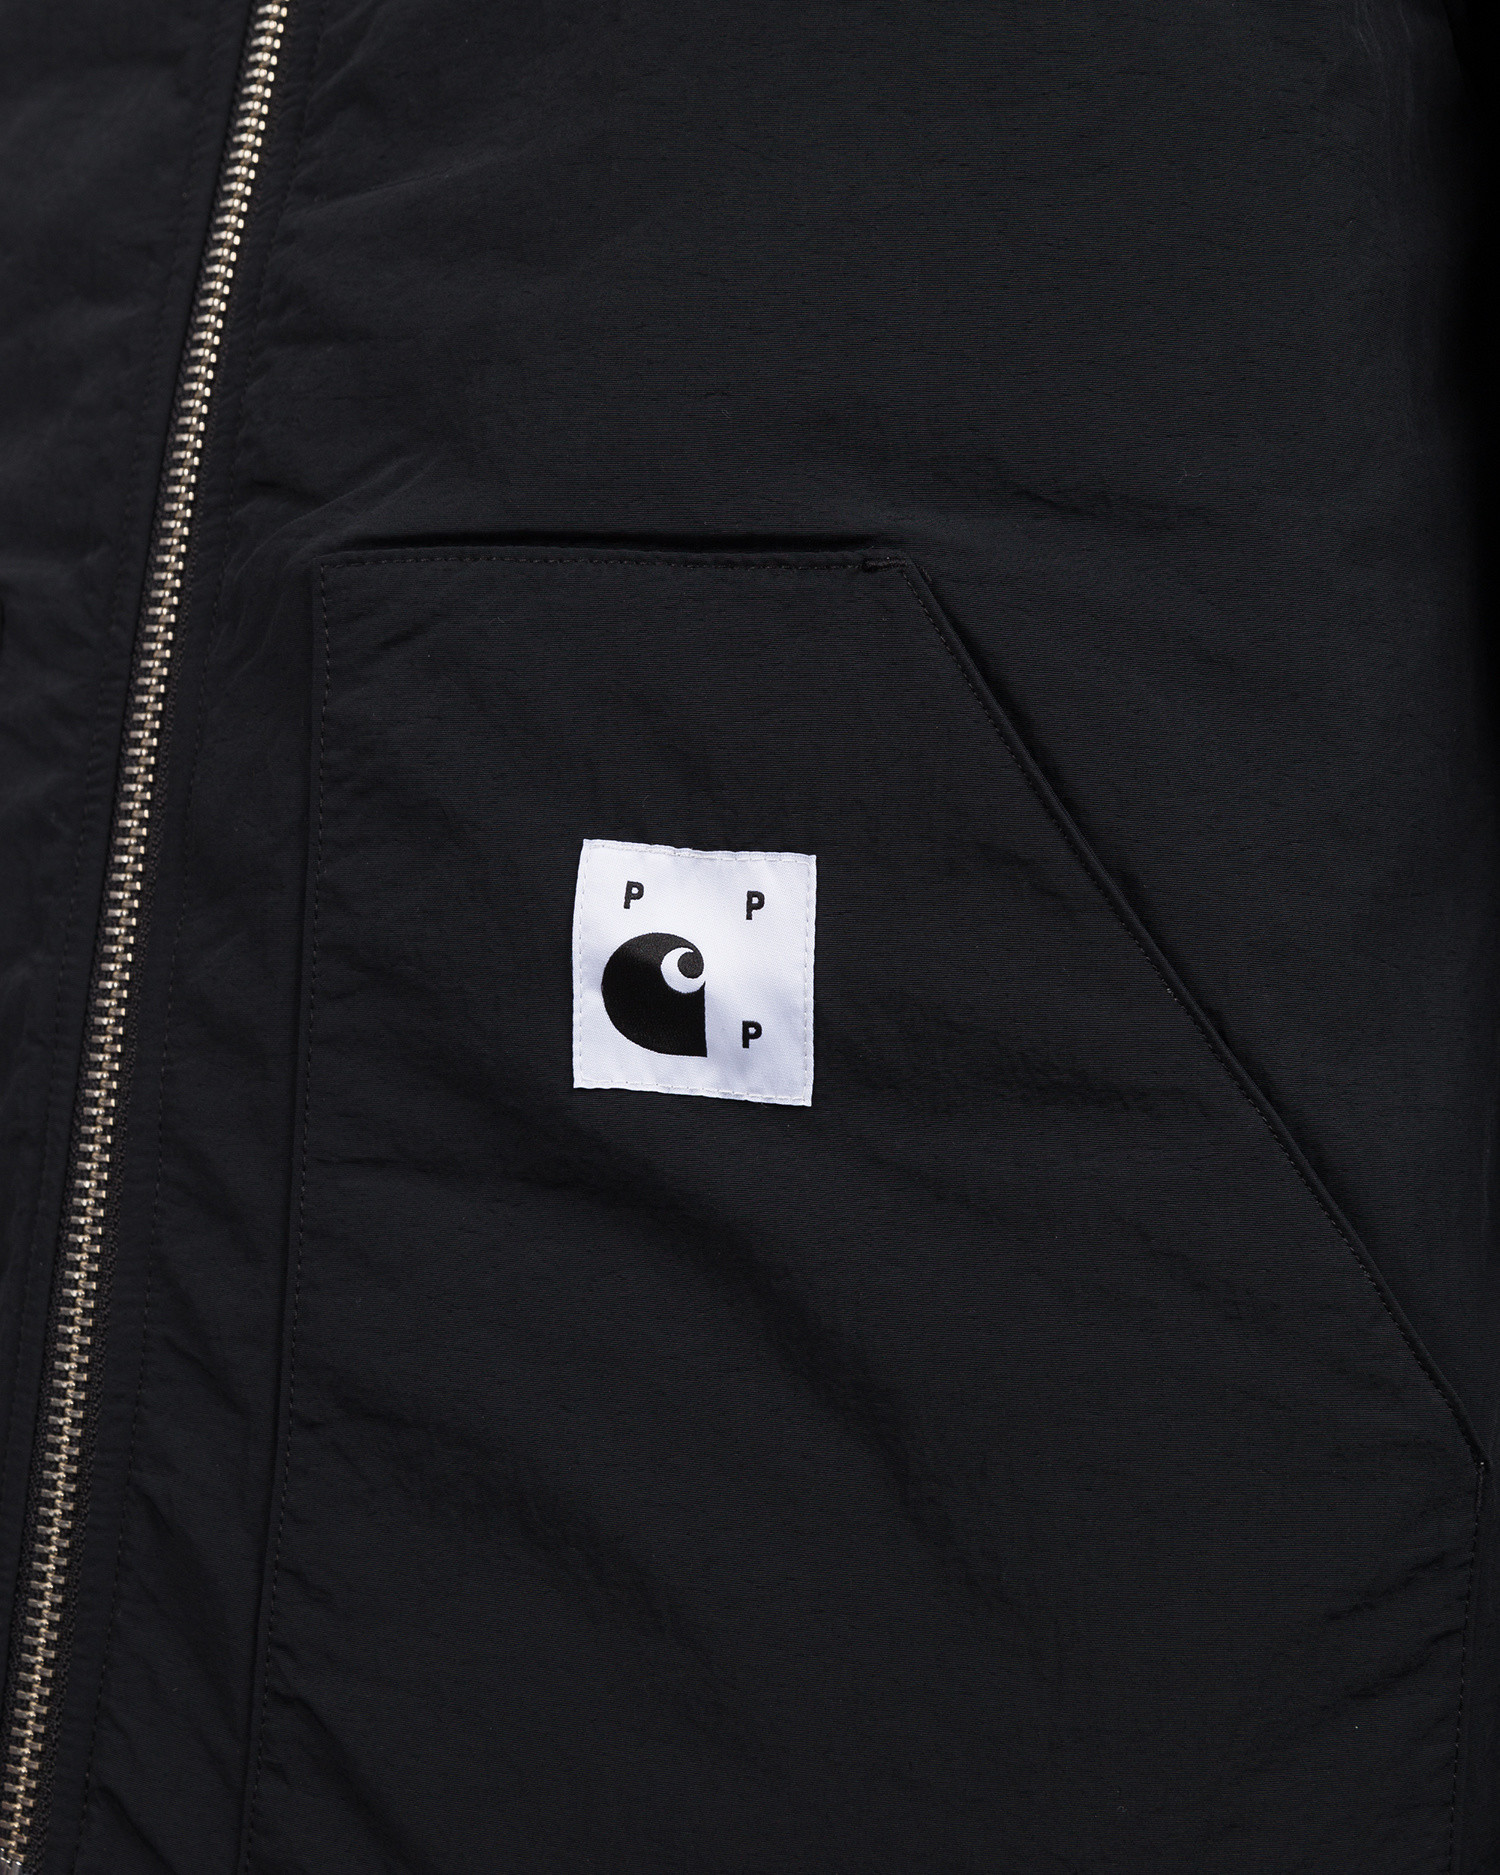 Carhartt x Pop Trading Co Classic Vest Black